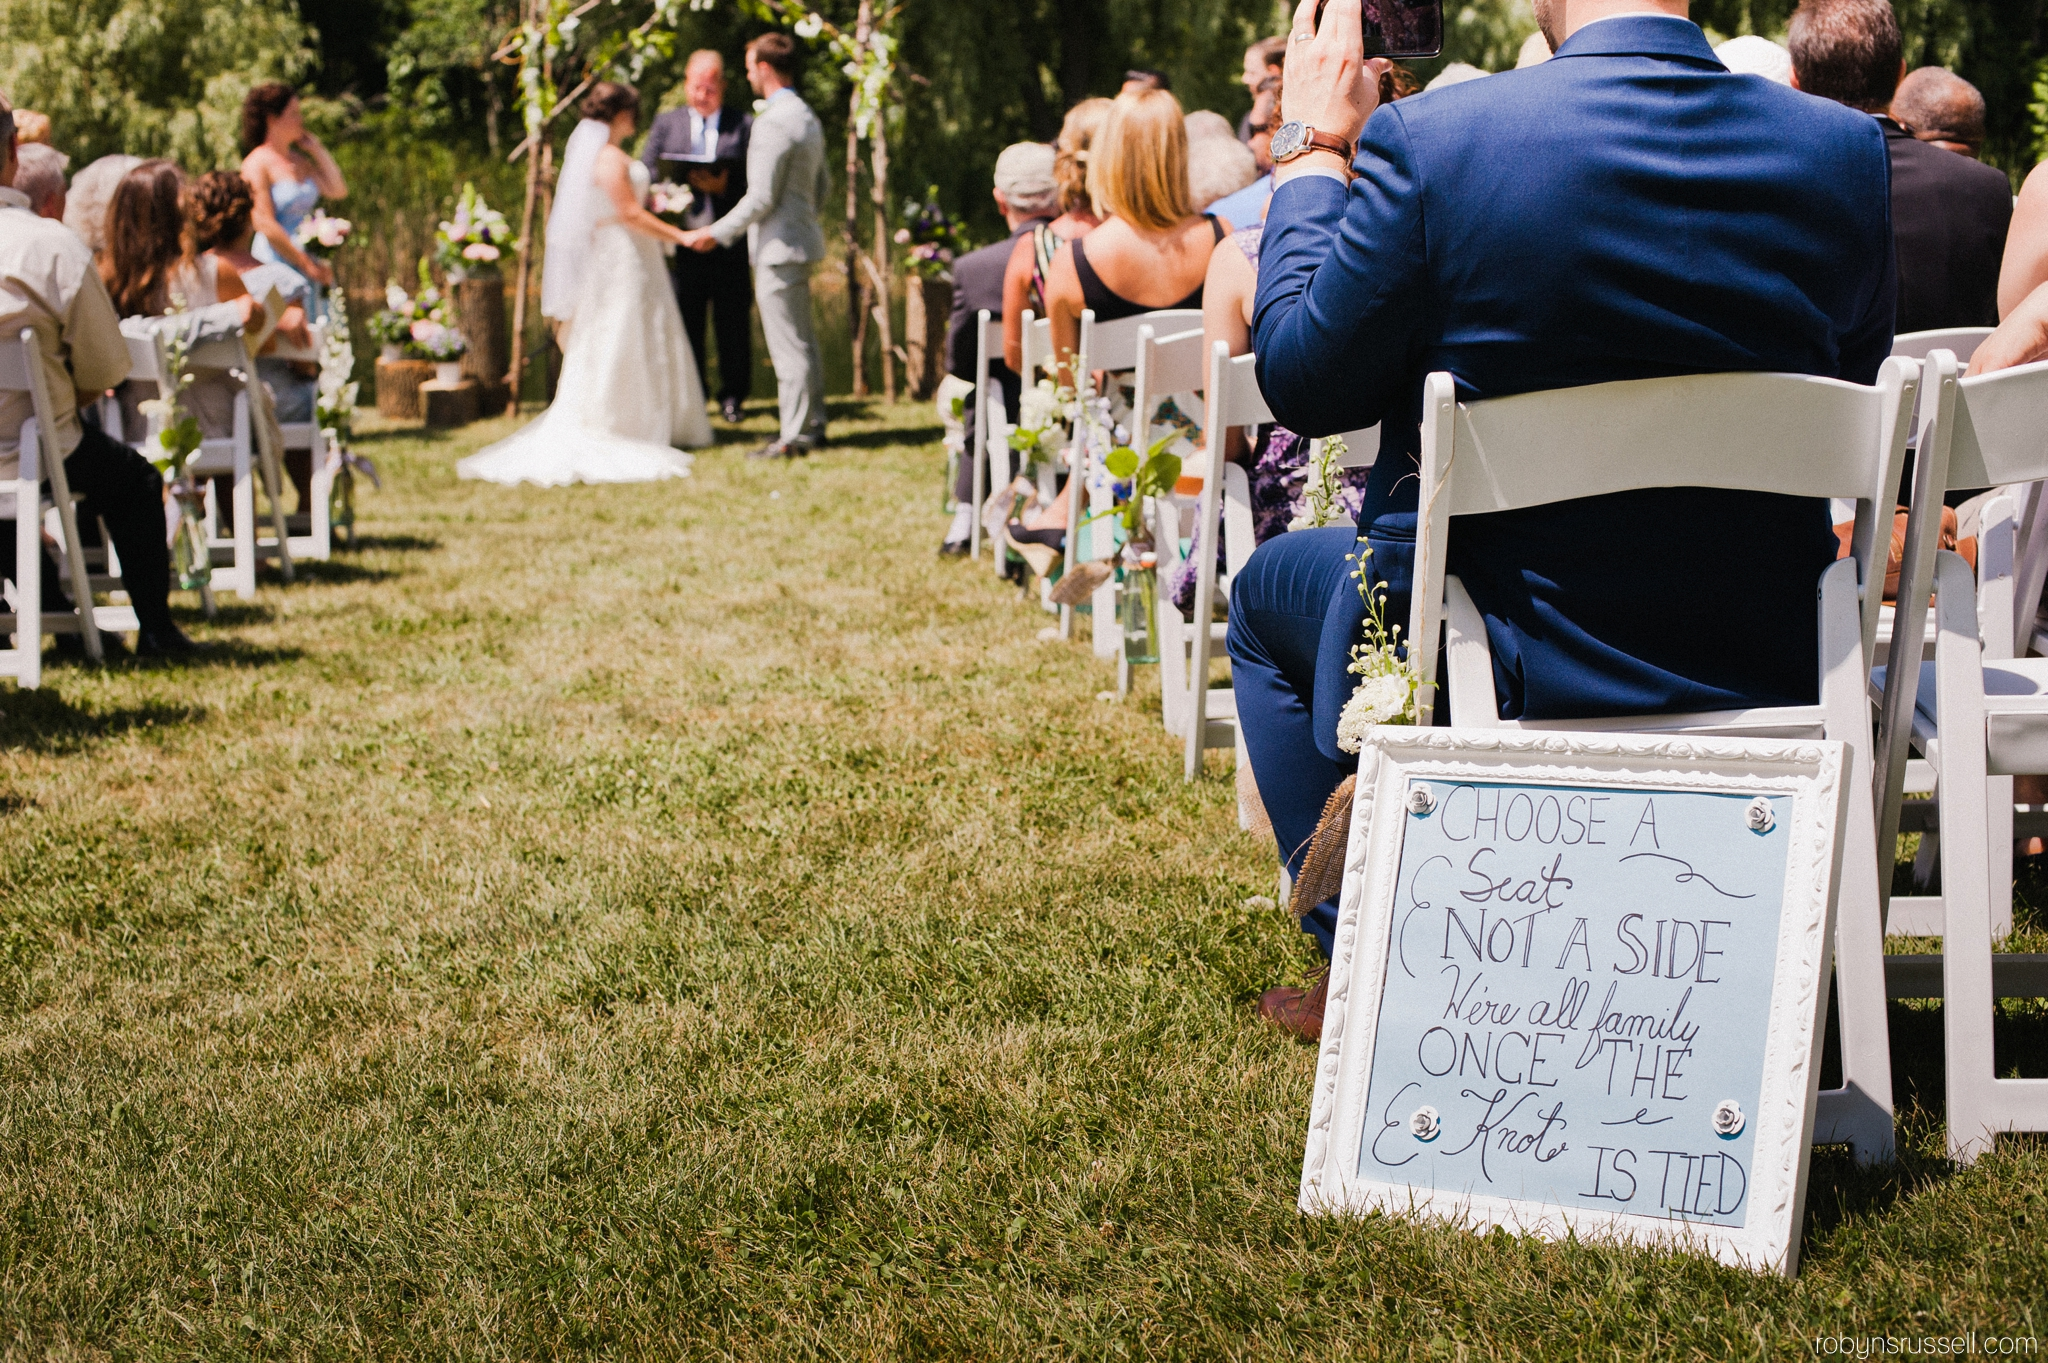 20-wedding-signage-at-ceremony-in-belwood-lake.jpg